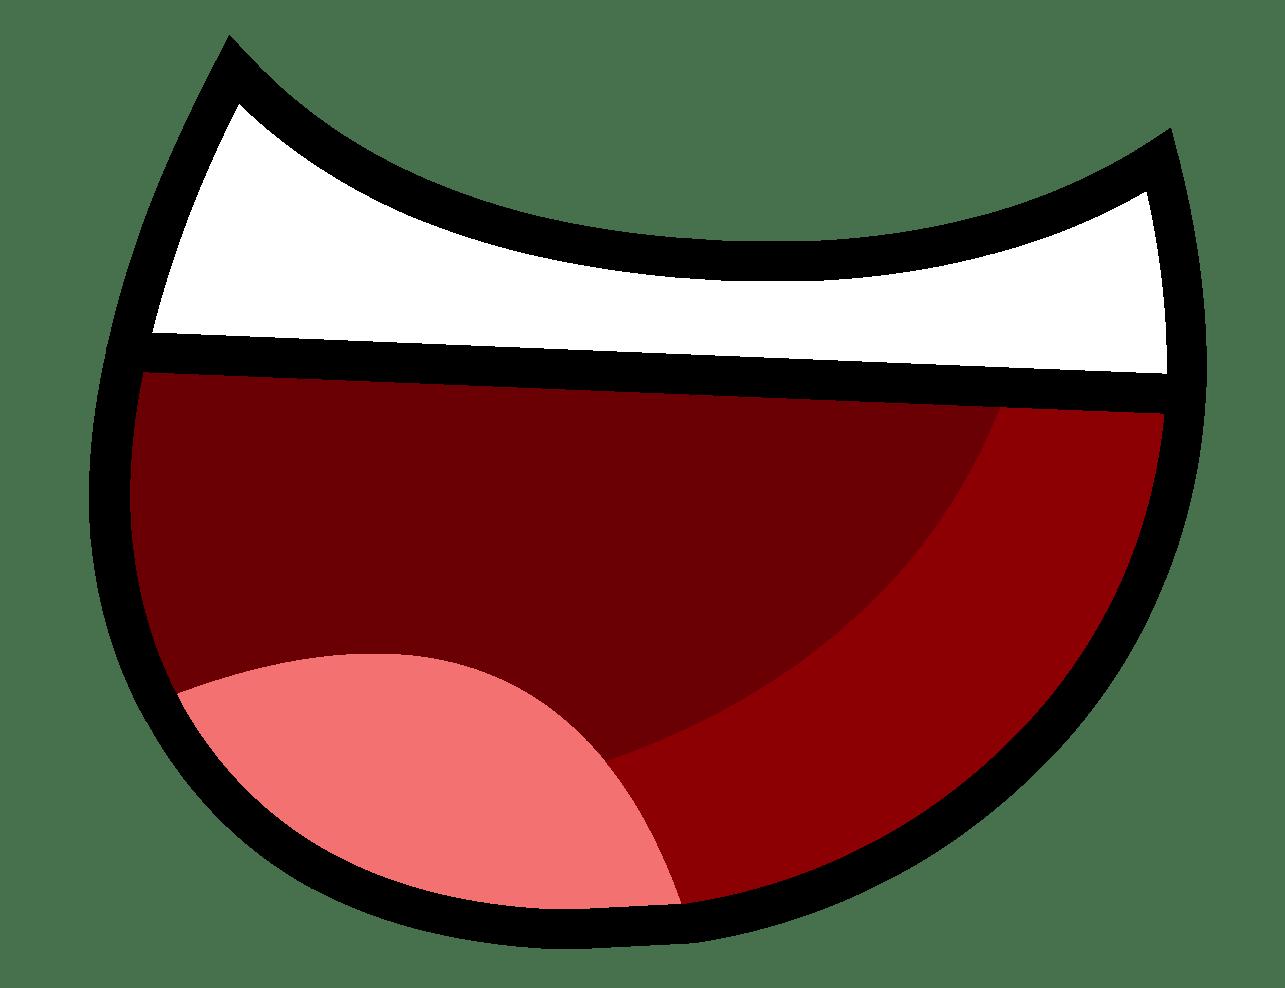 Cartoon Mouth Open - Cliparts.co